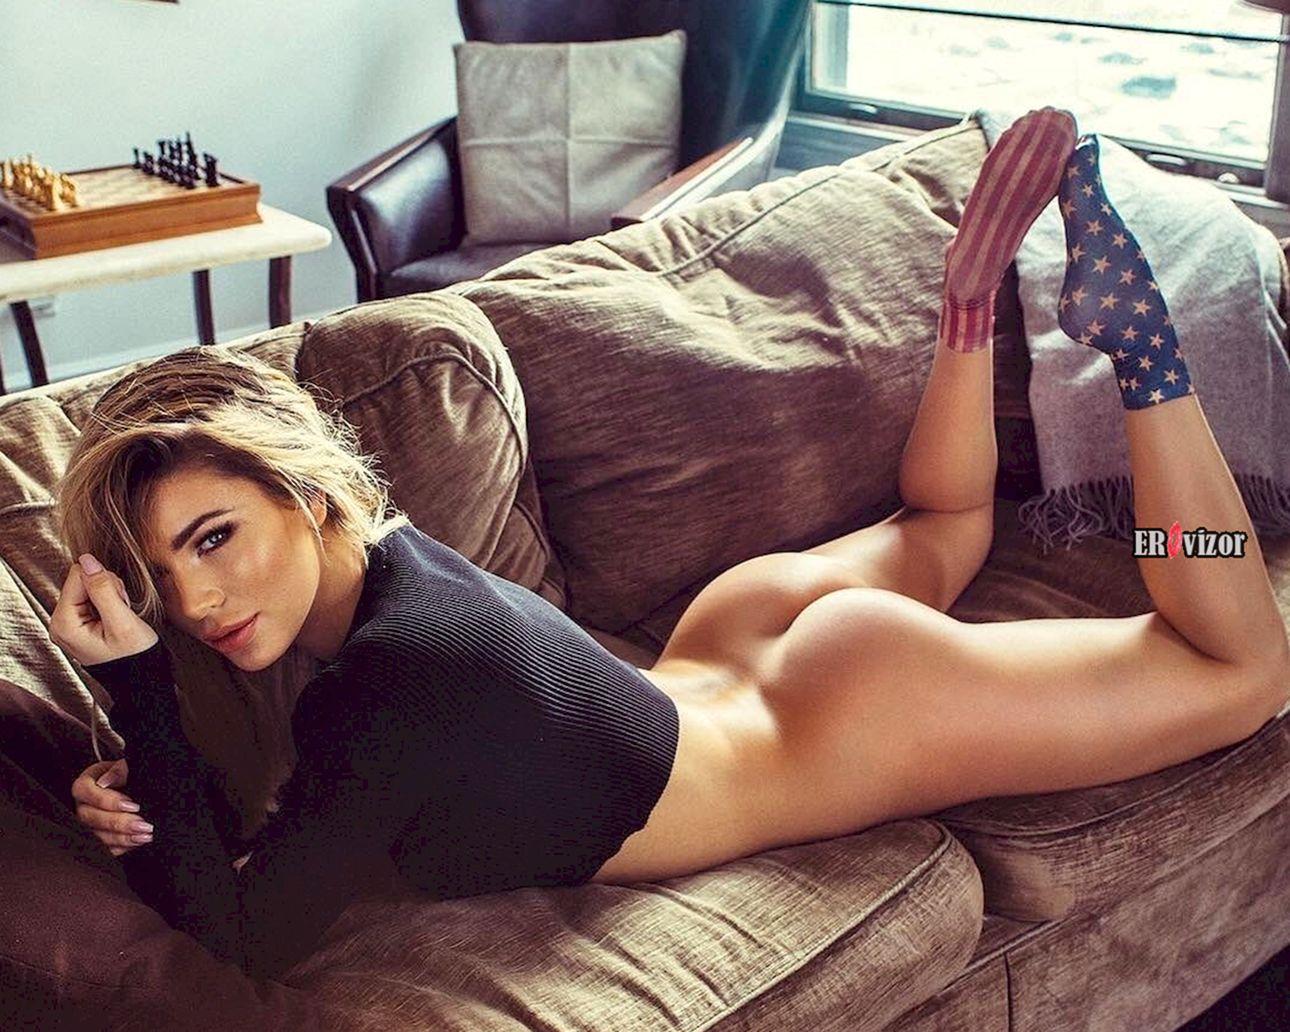 красивая попка девушки на диване